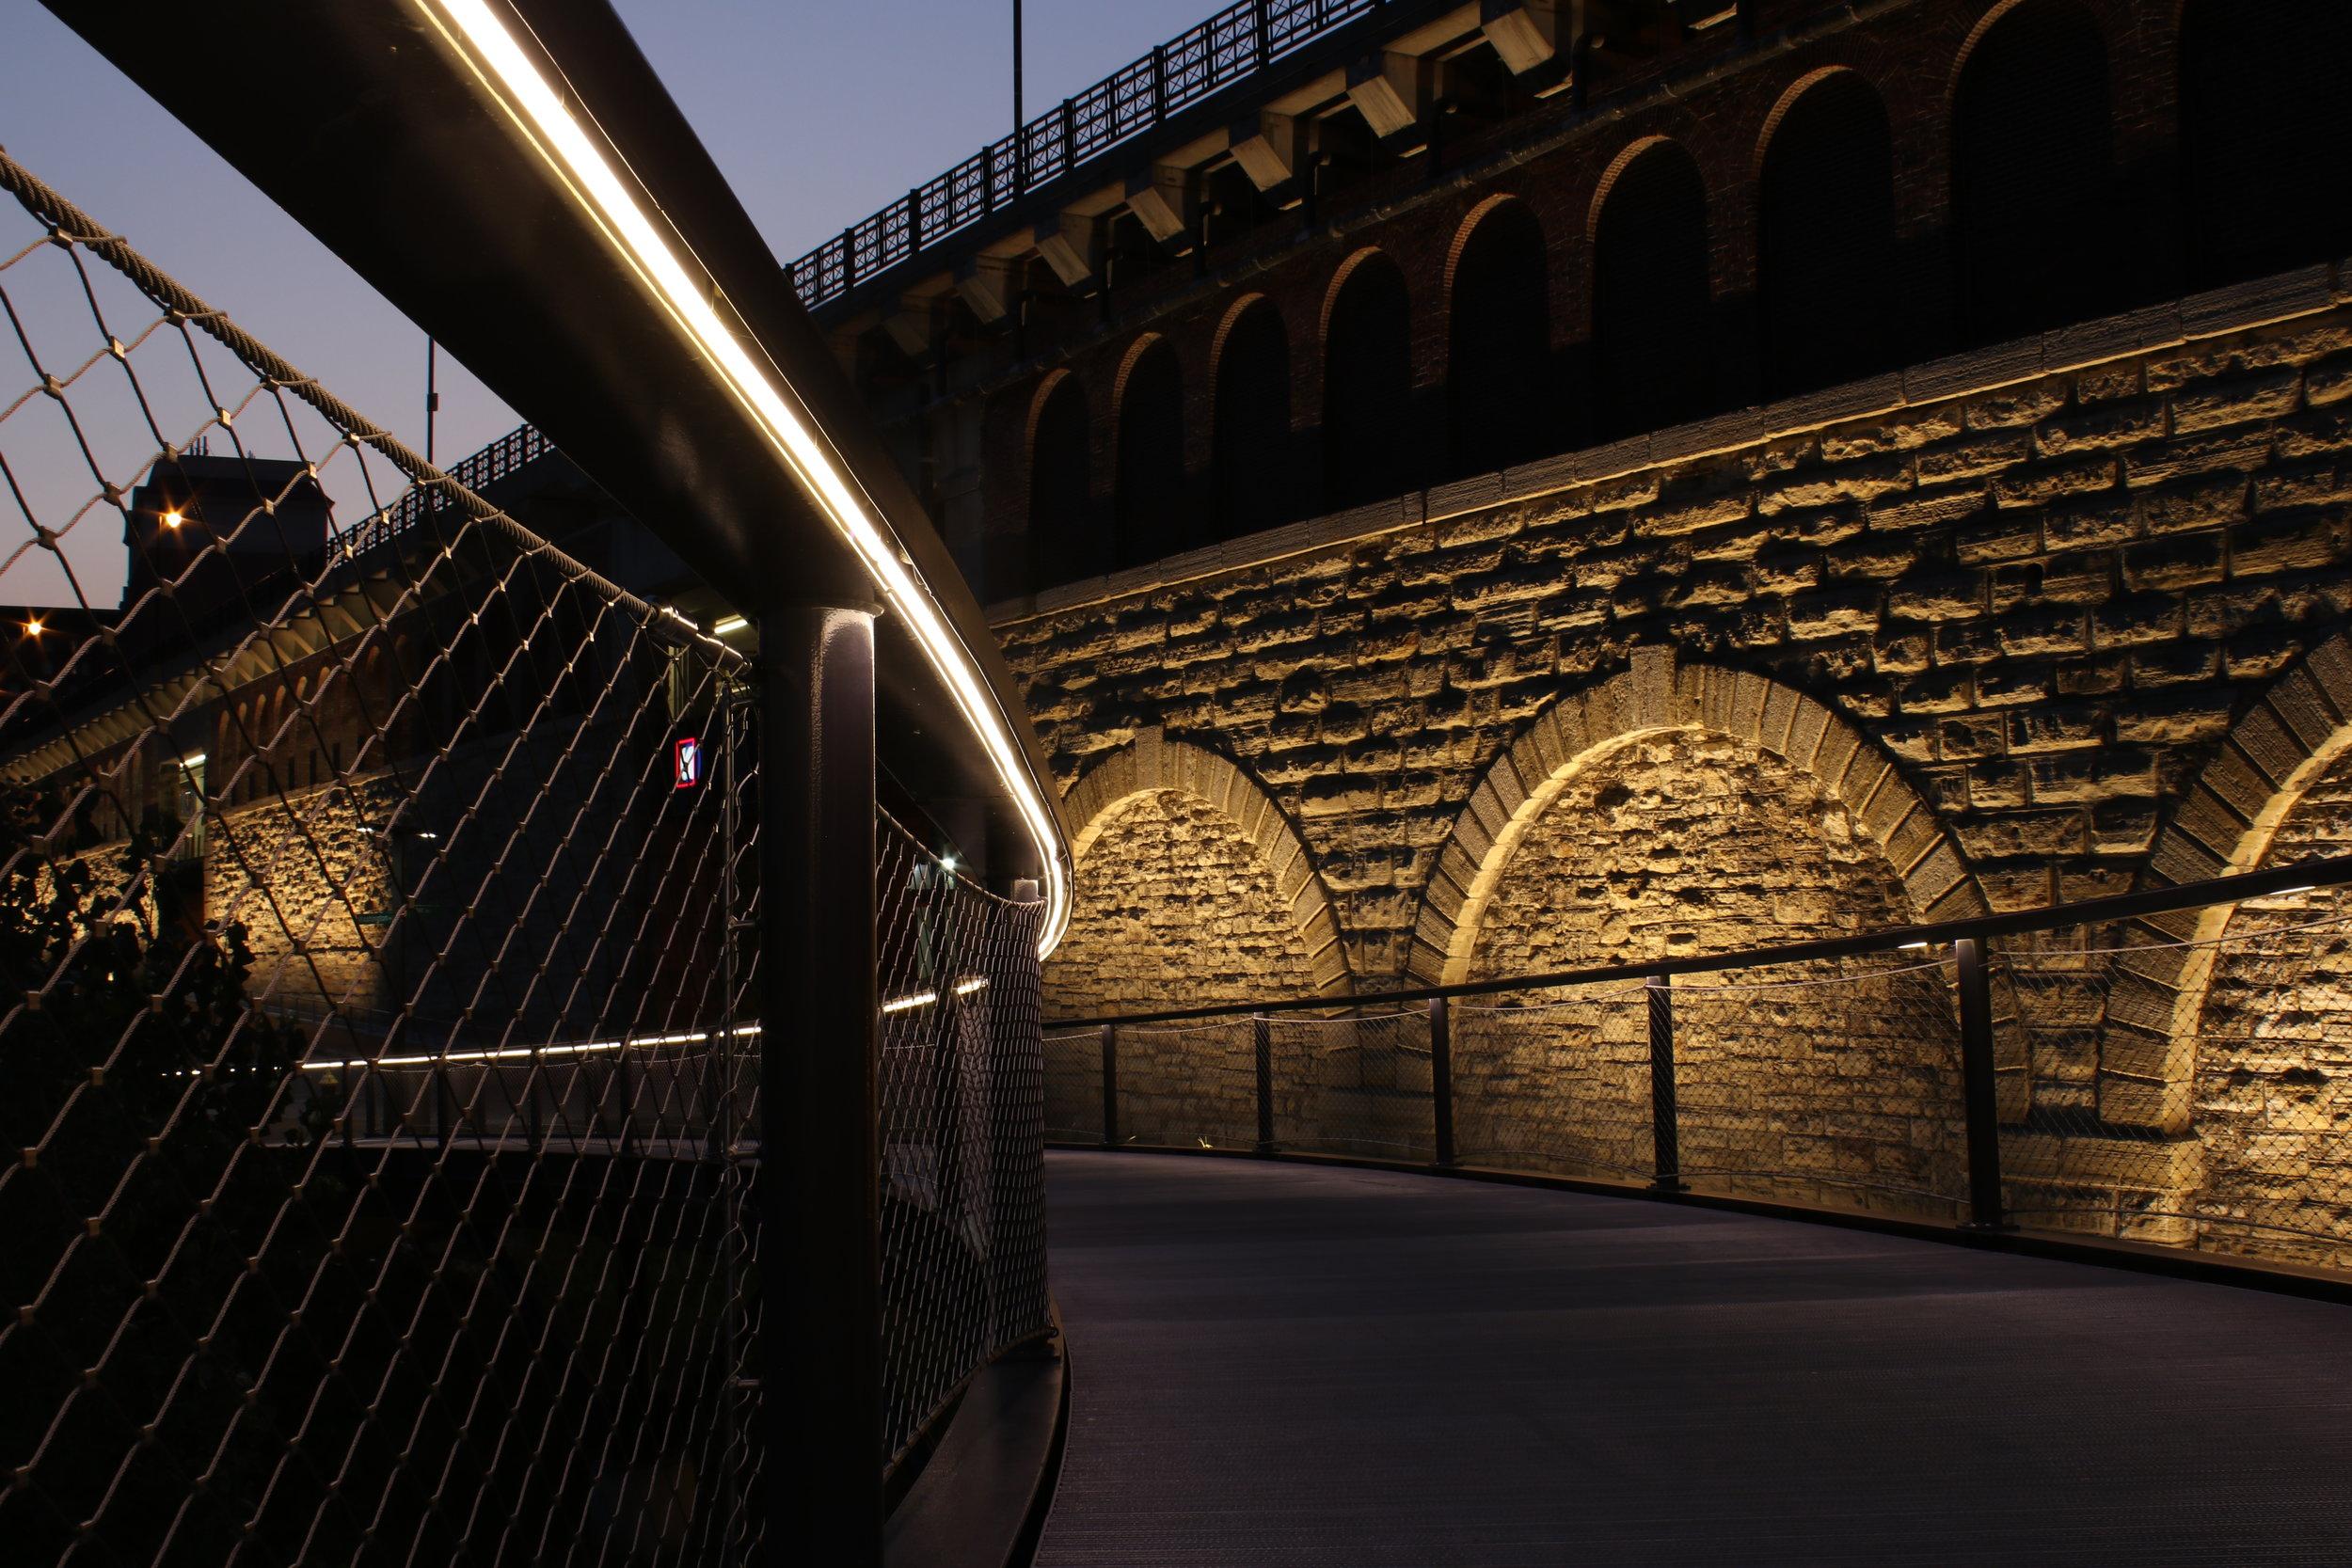 iLight-5-St-Louis-Arch-Park-LED-handrail-12.jpg